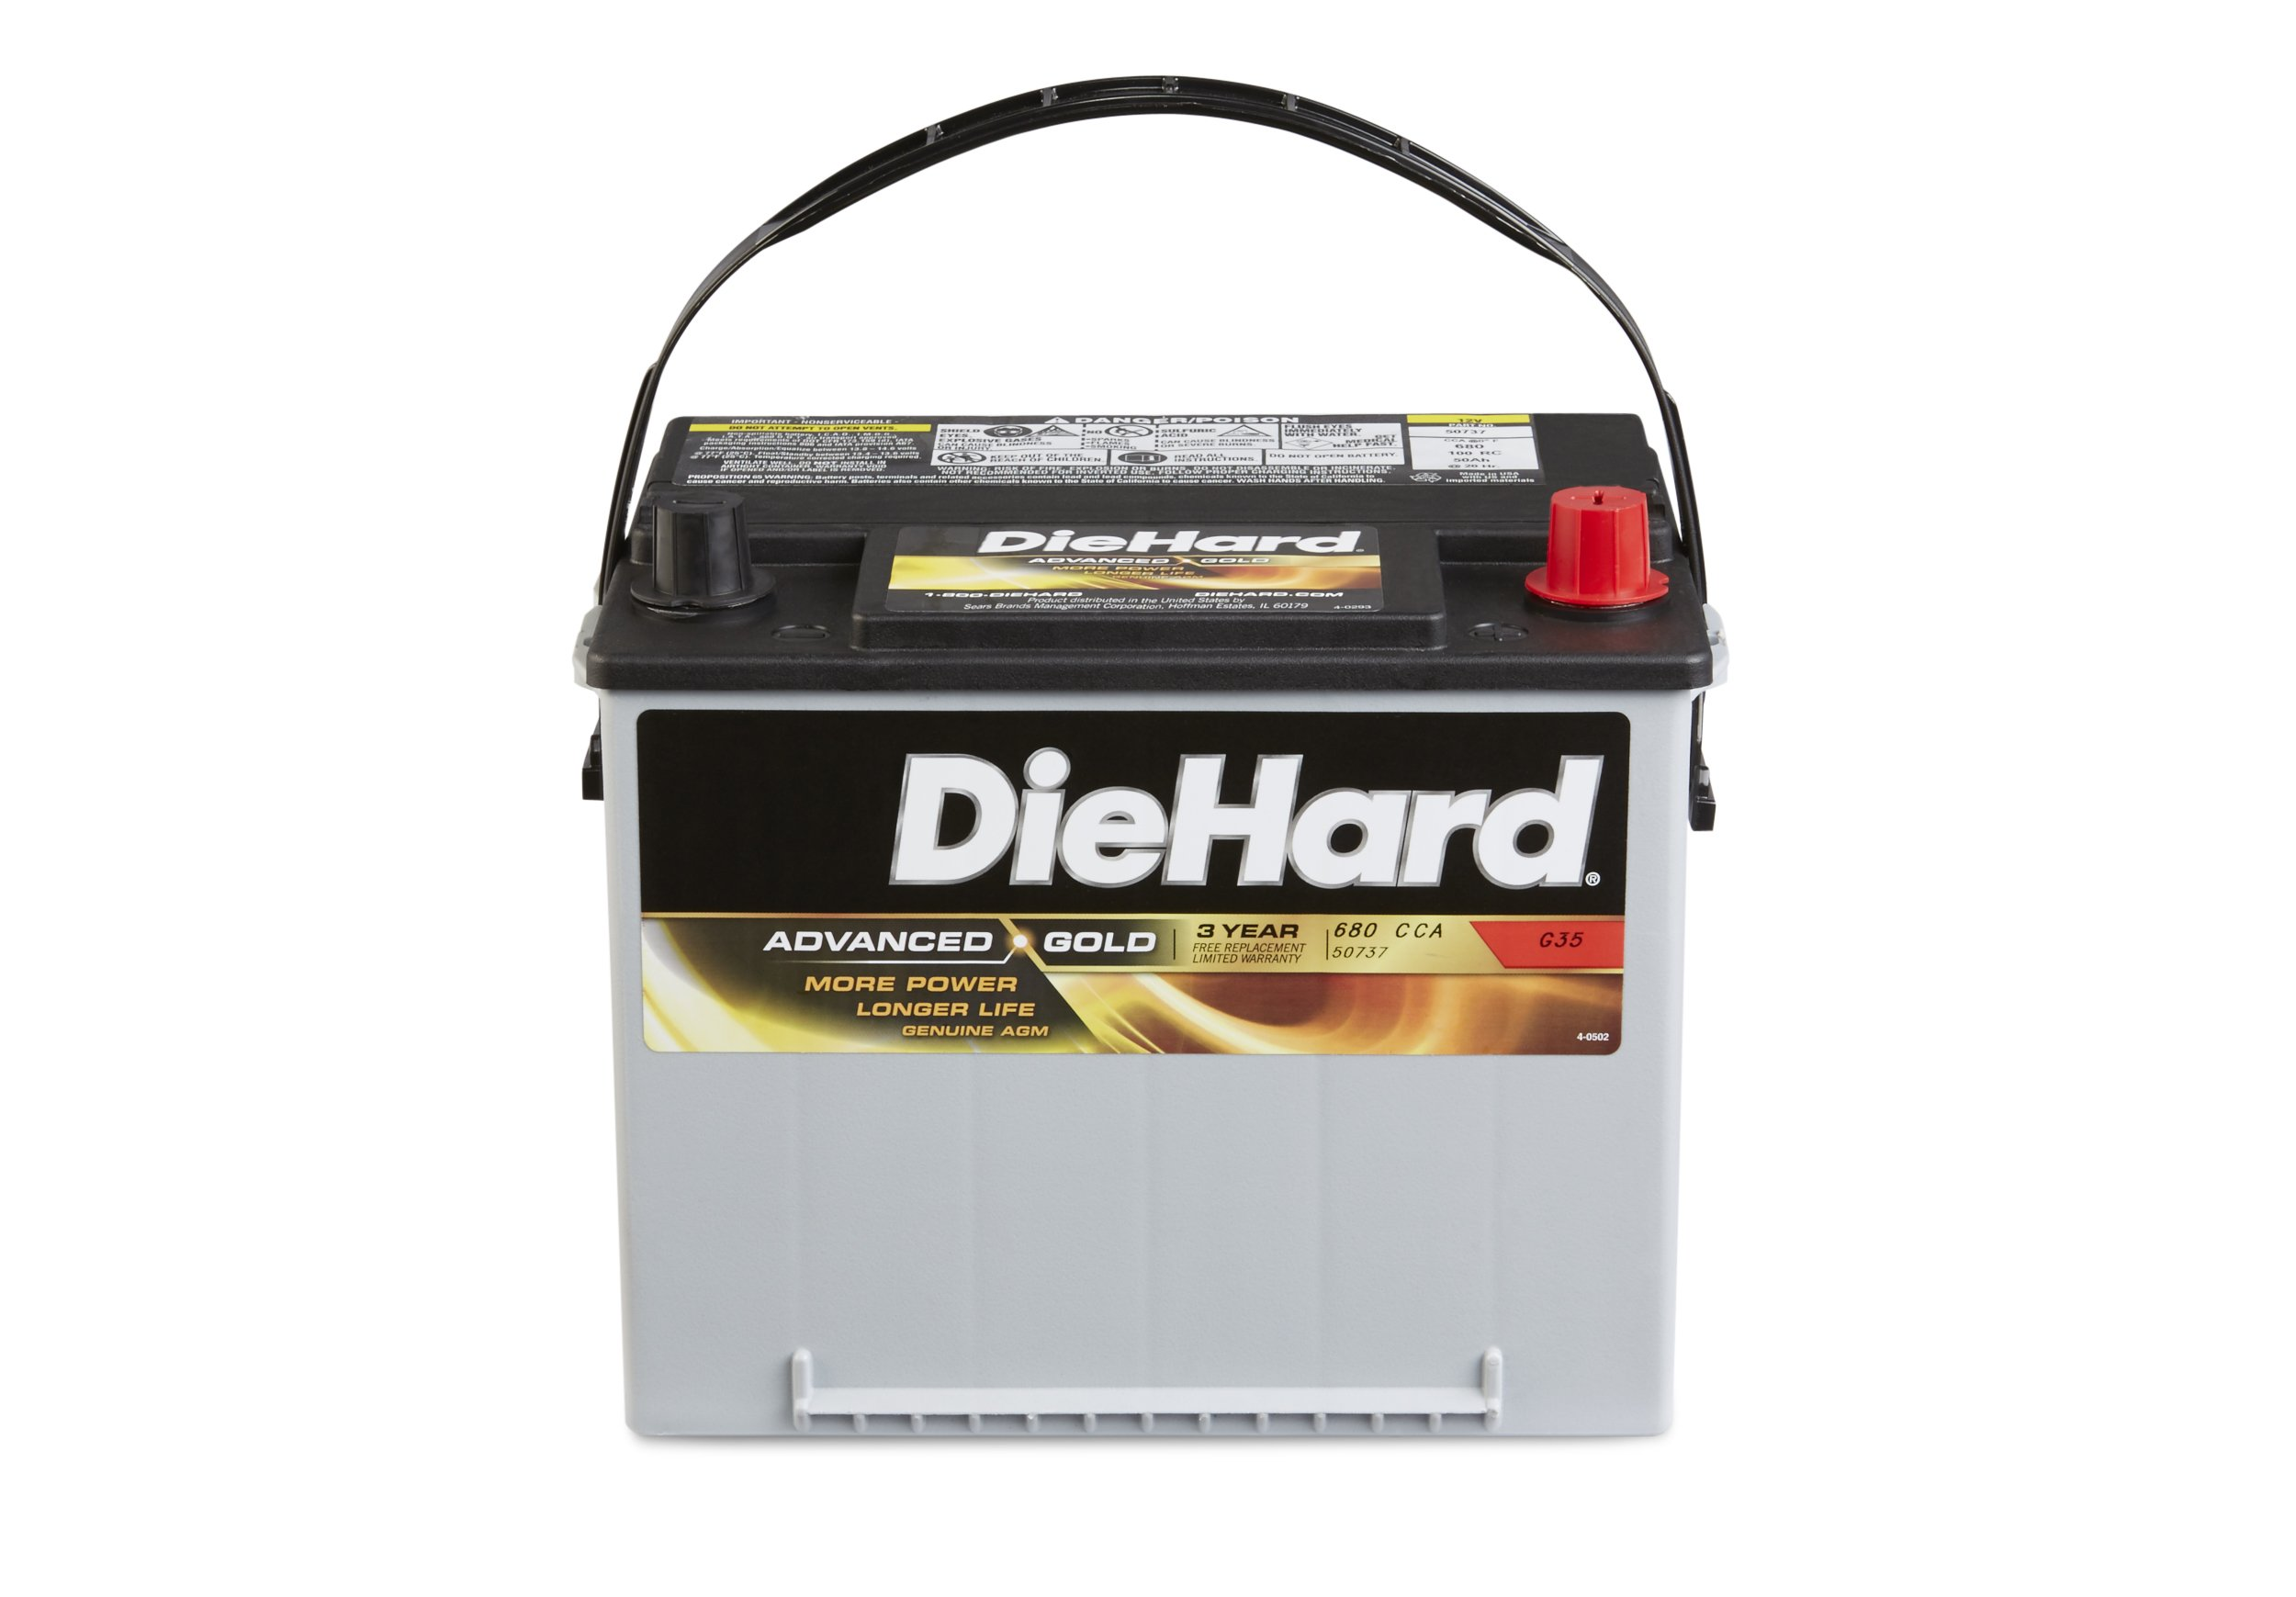 DieHard 38275 Advanced Gold AGM Battery (GP 35) by DieHard (Image #2)